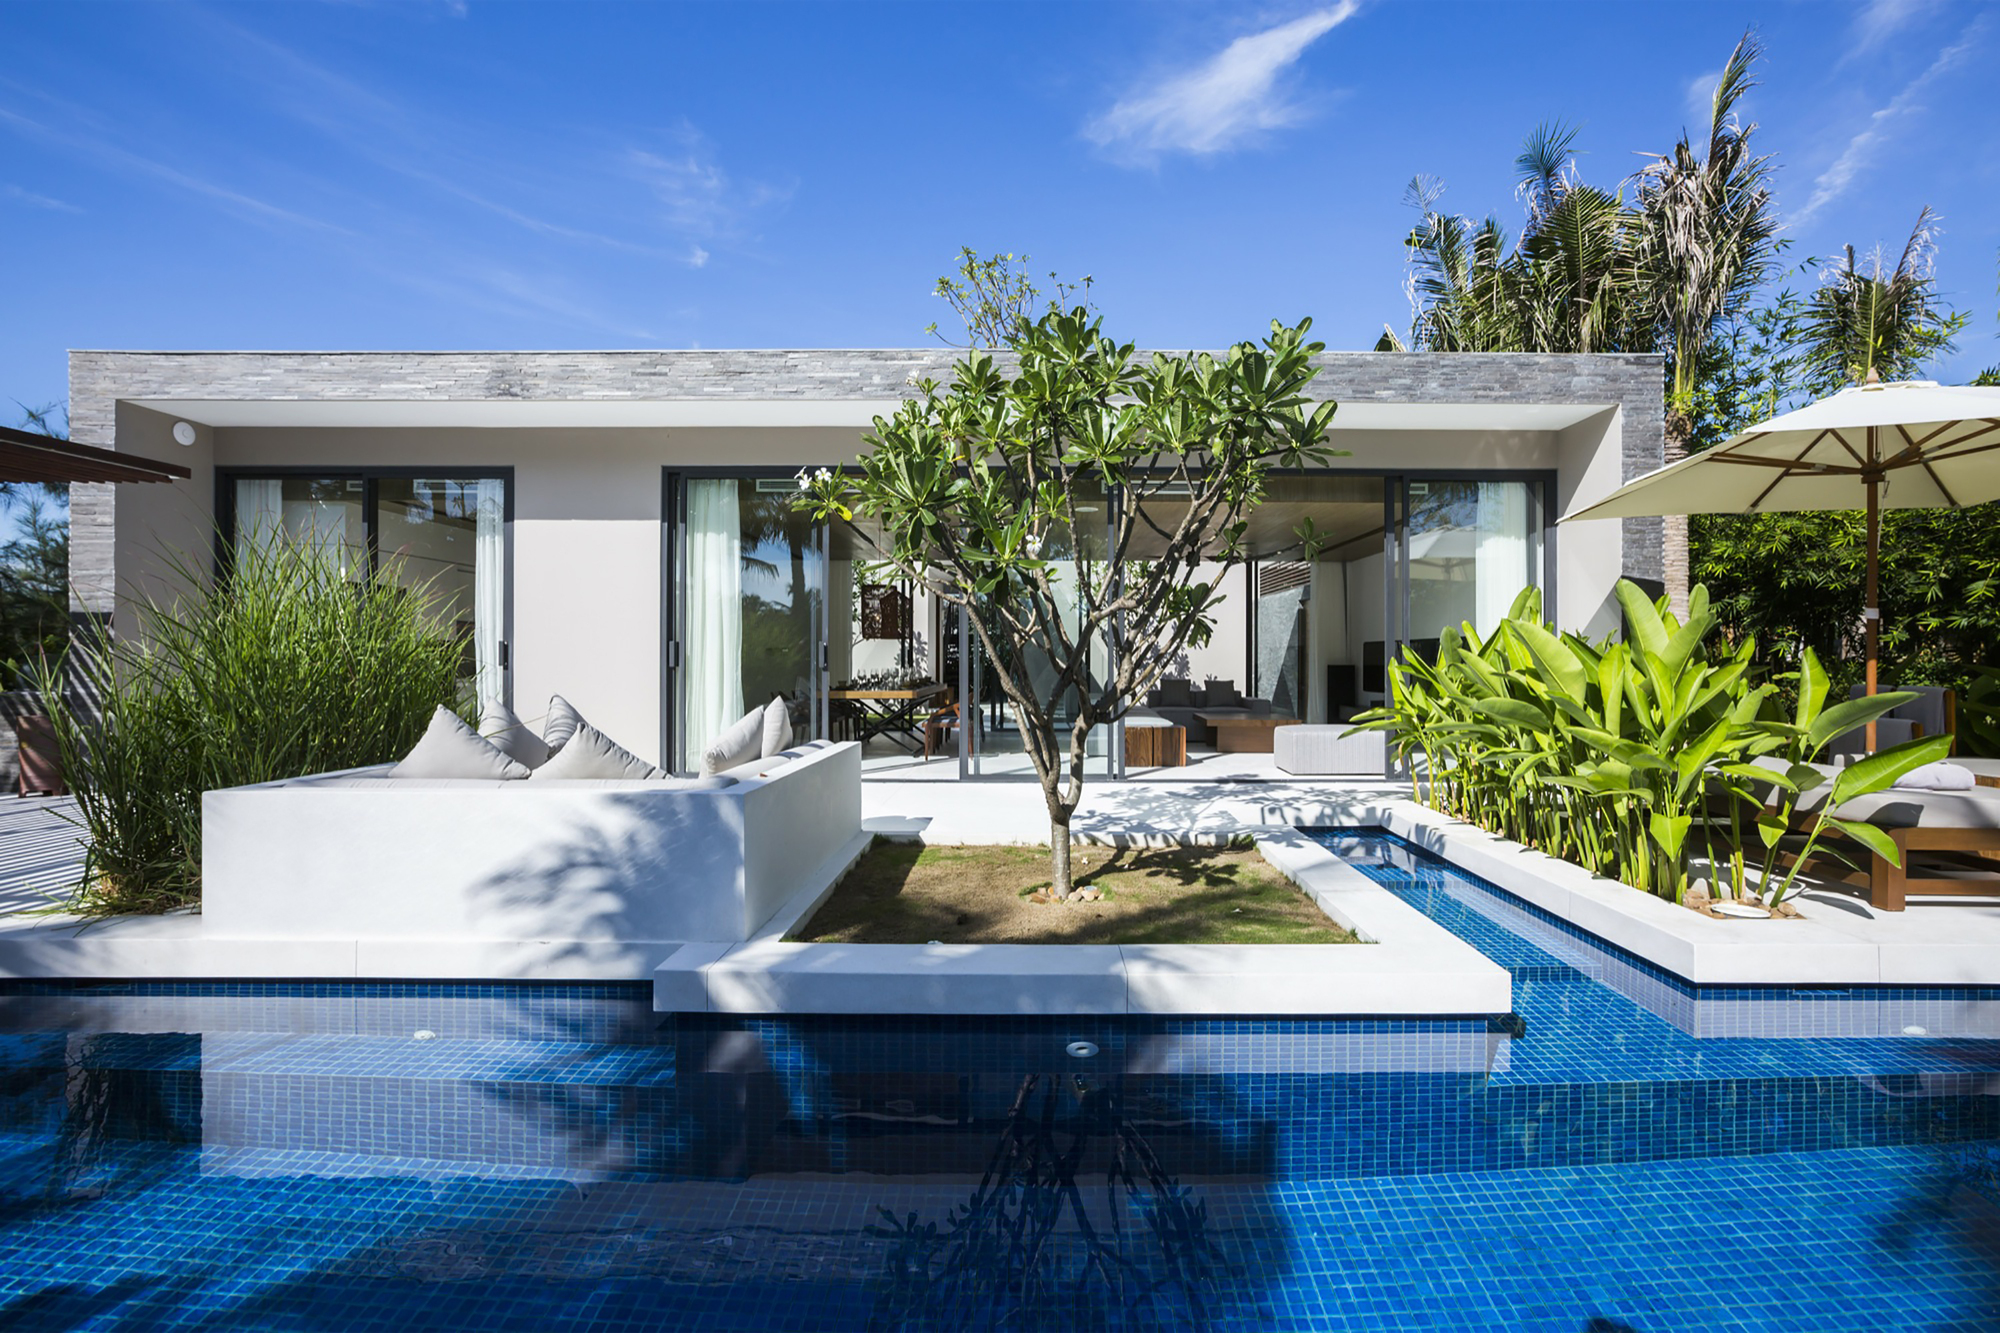 Naman Residences - Villa Mia Design Studio 10